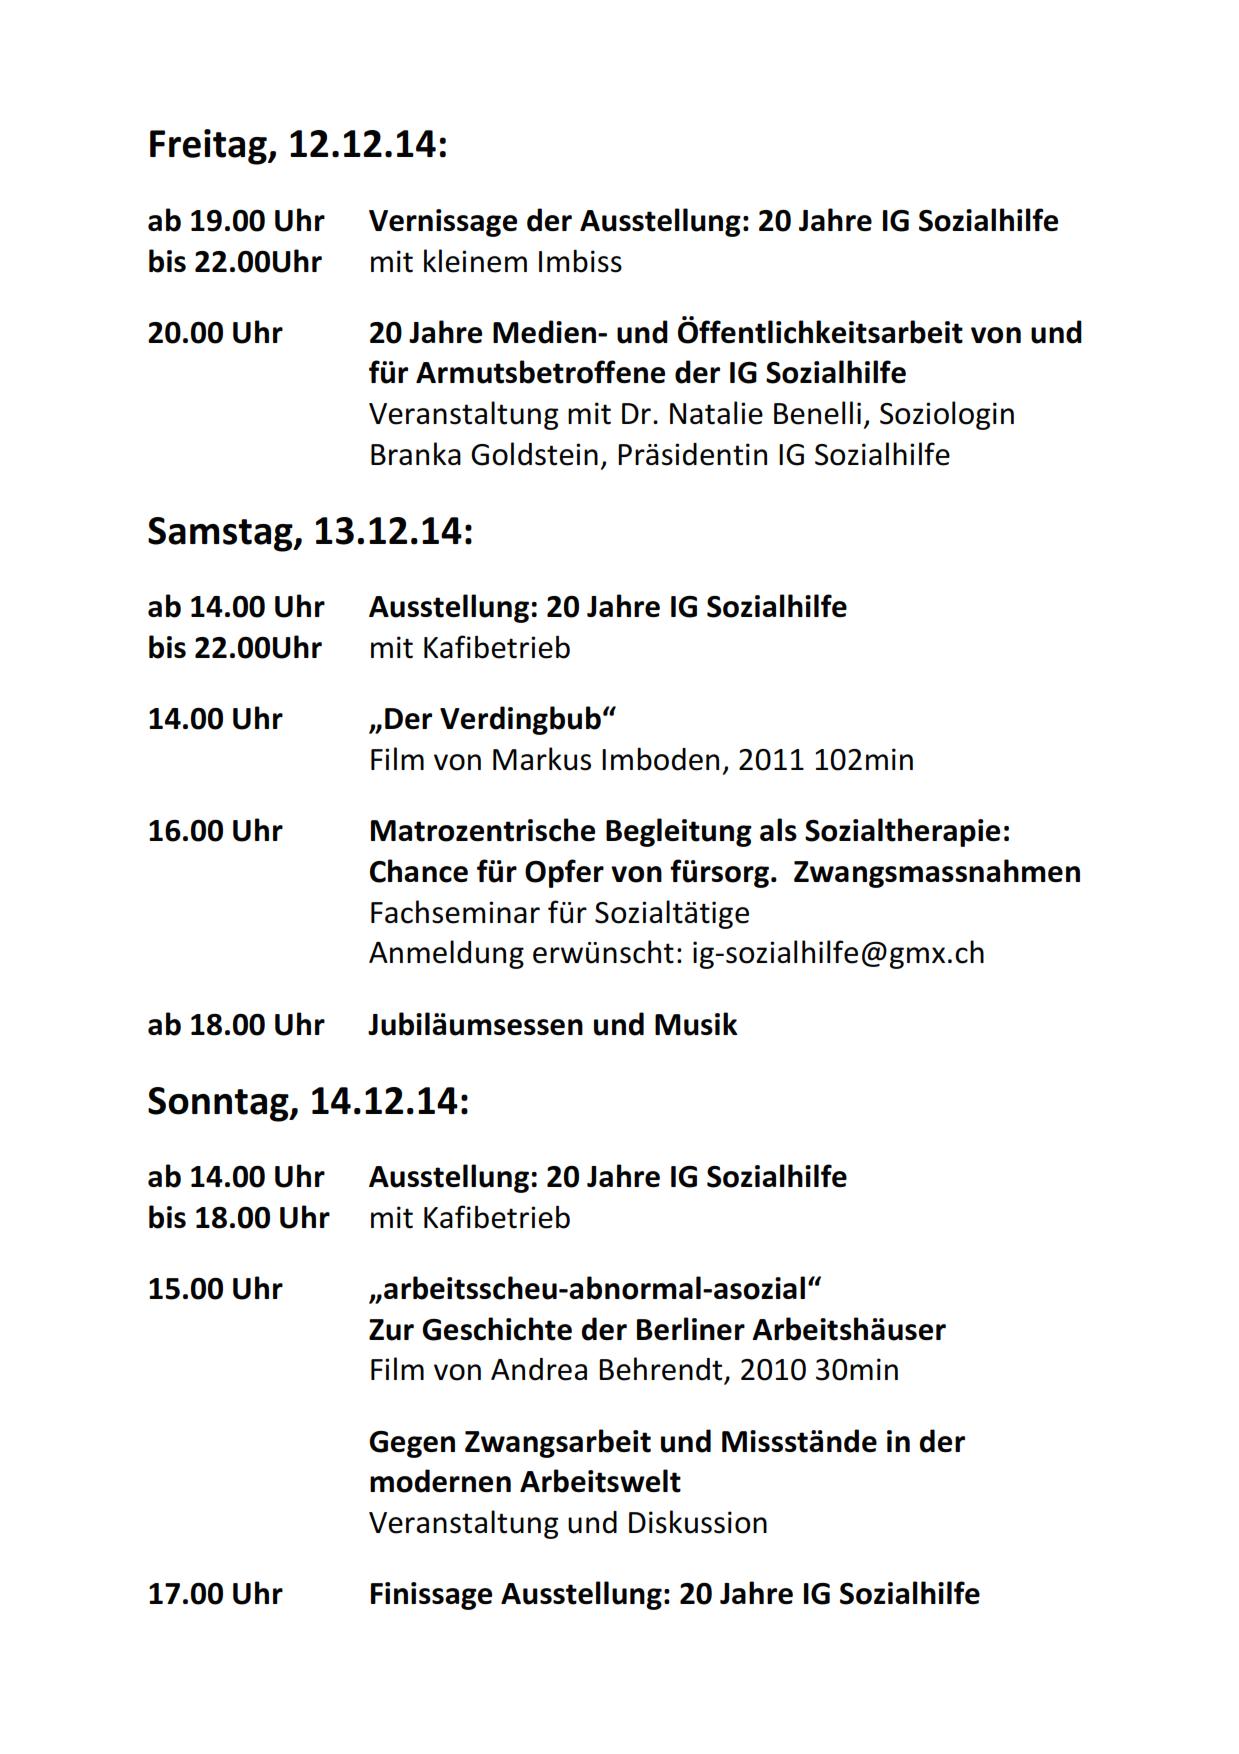 Flugblatt 20 Jahre IG Sozialhilfe 2014.korr_003